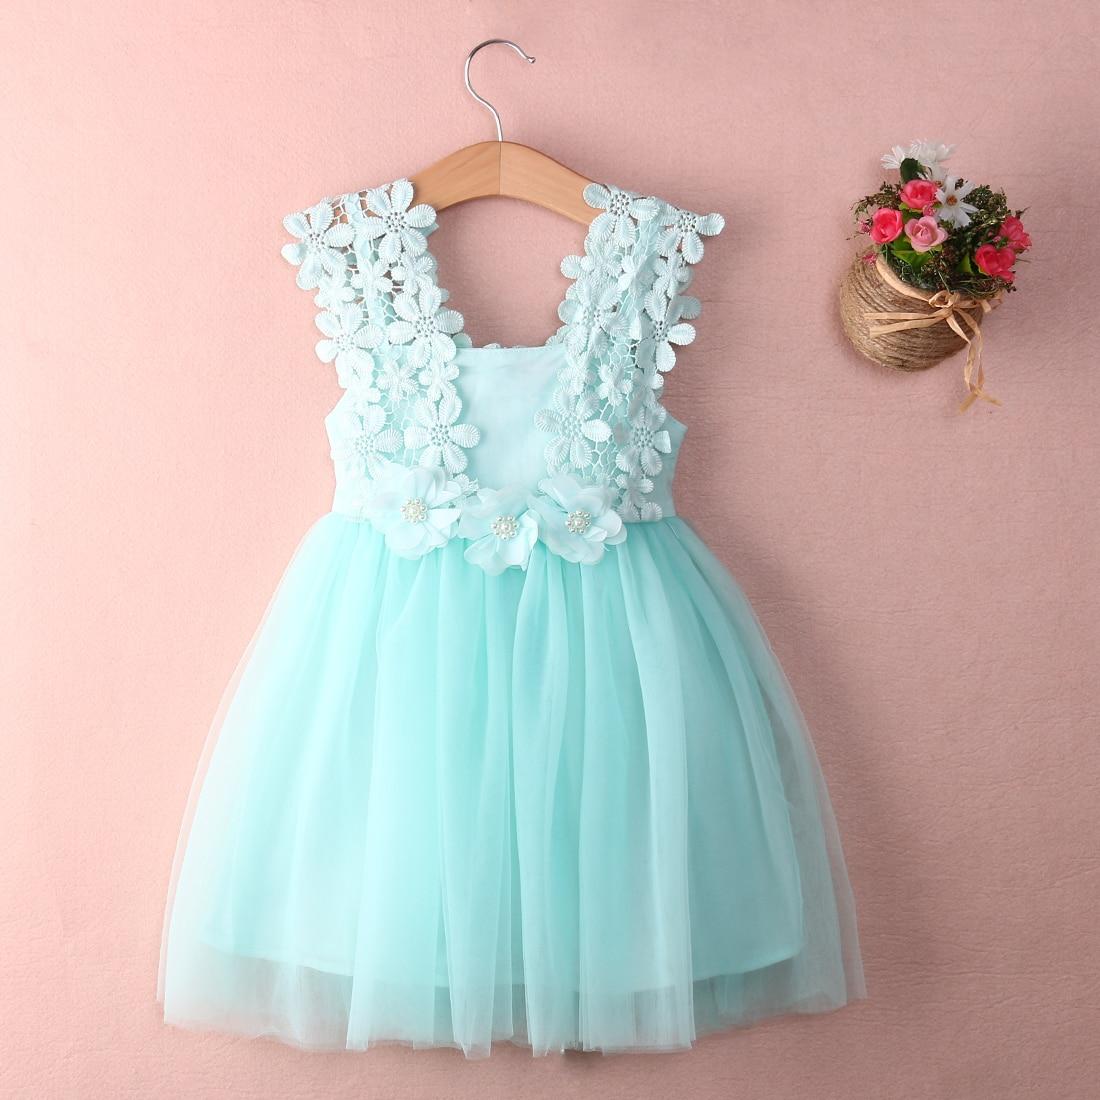 Girl Dress Mermaid Tulle Wedding Party Dress 2017 Summer Princess ...